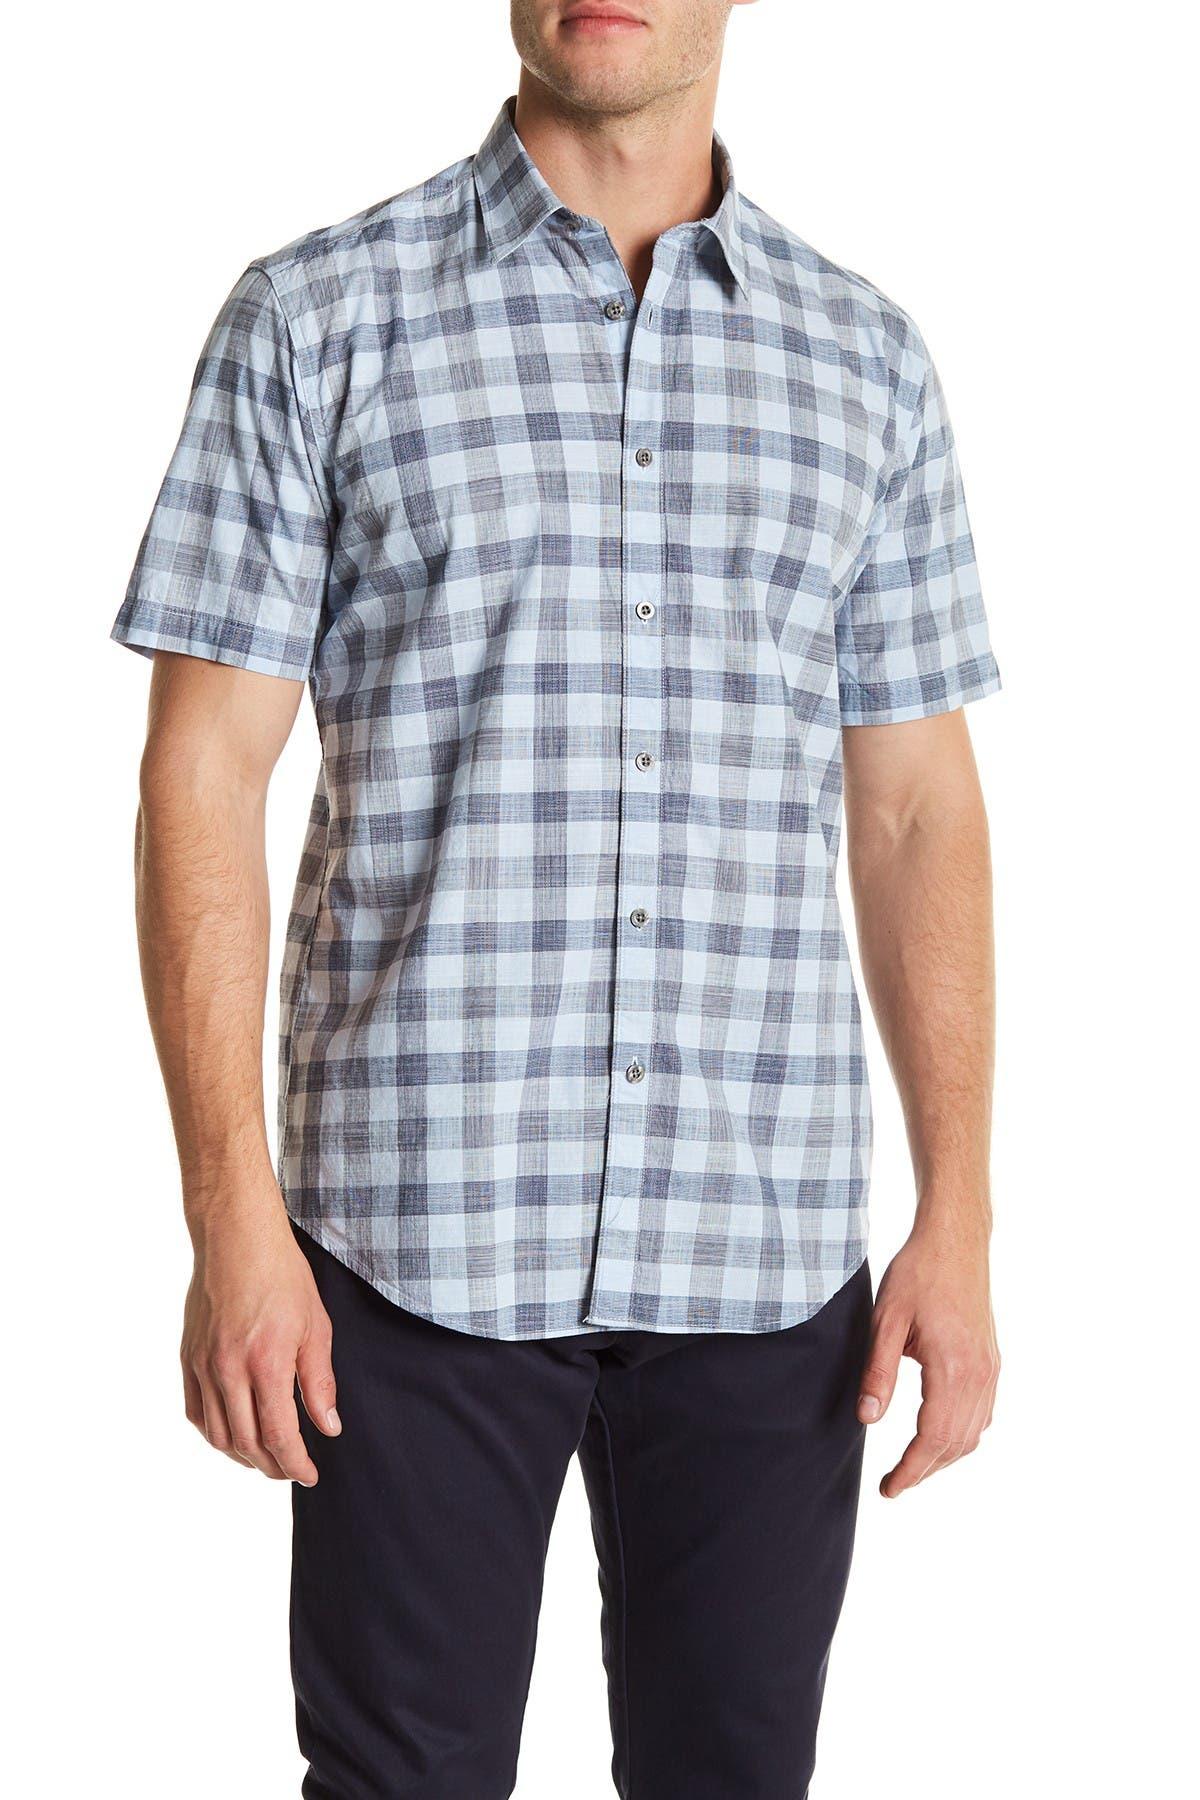 Image of COASTAORO Omar Check Short Sleeve Regular Fit Shirt